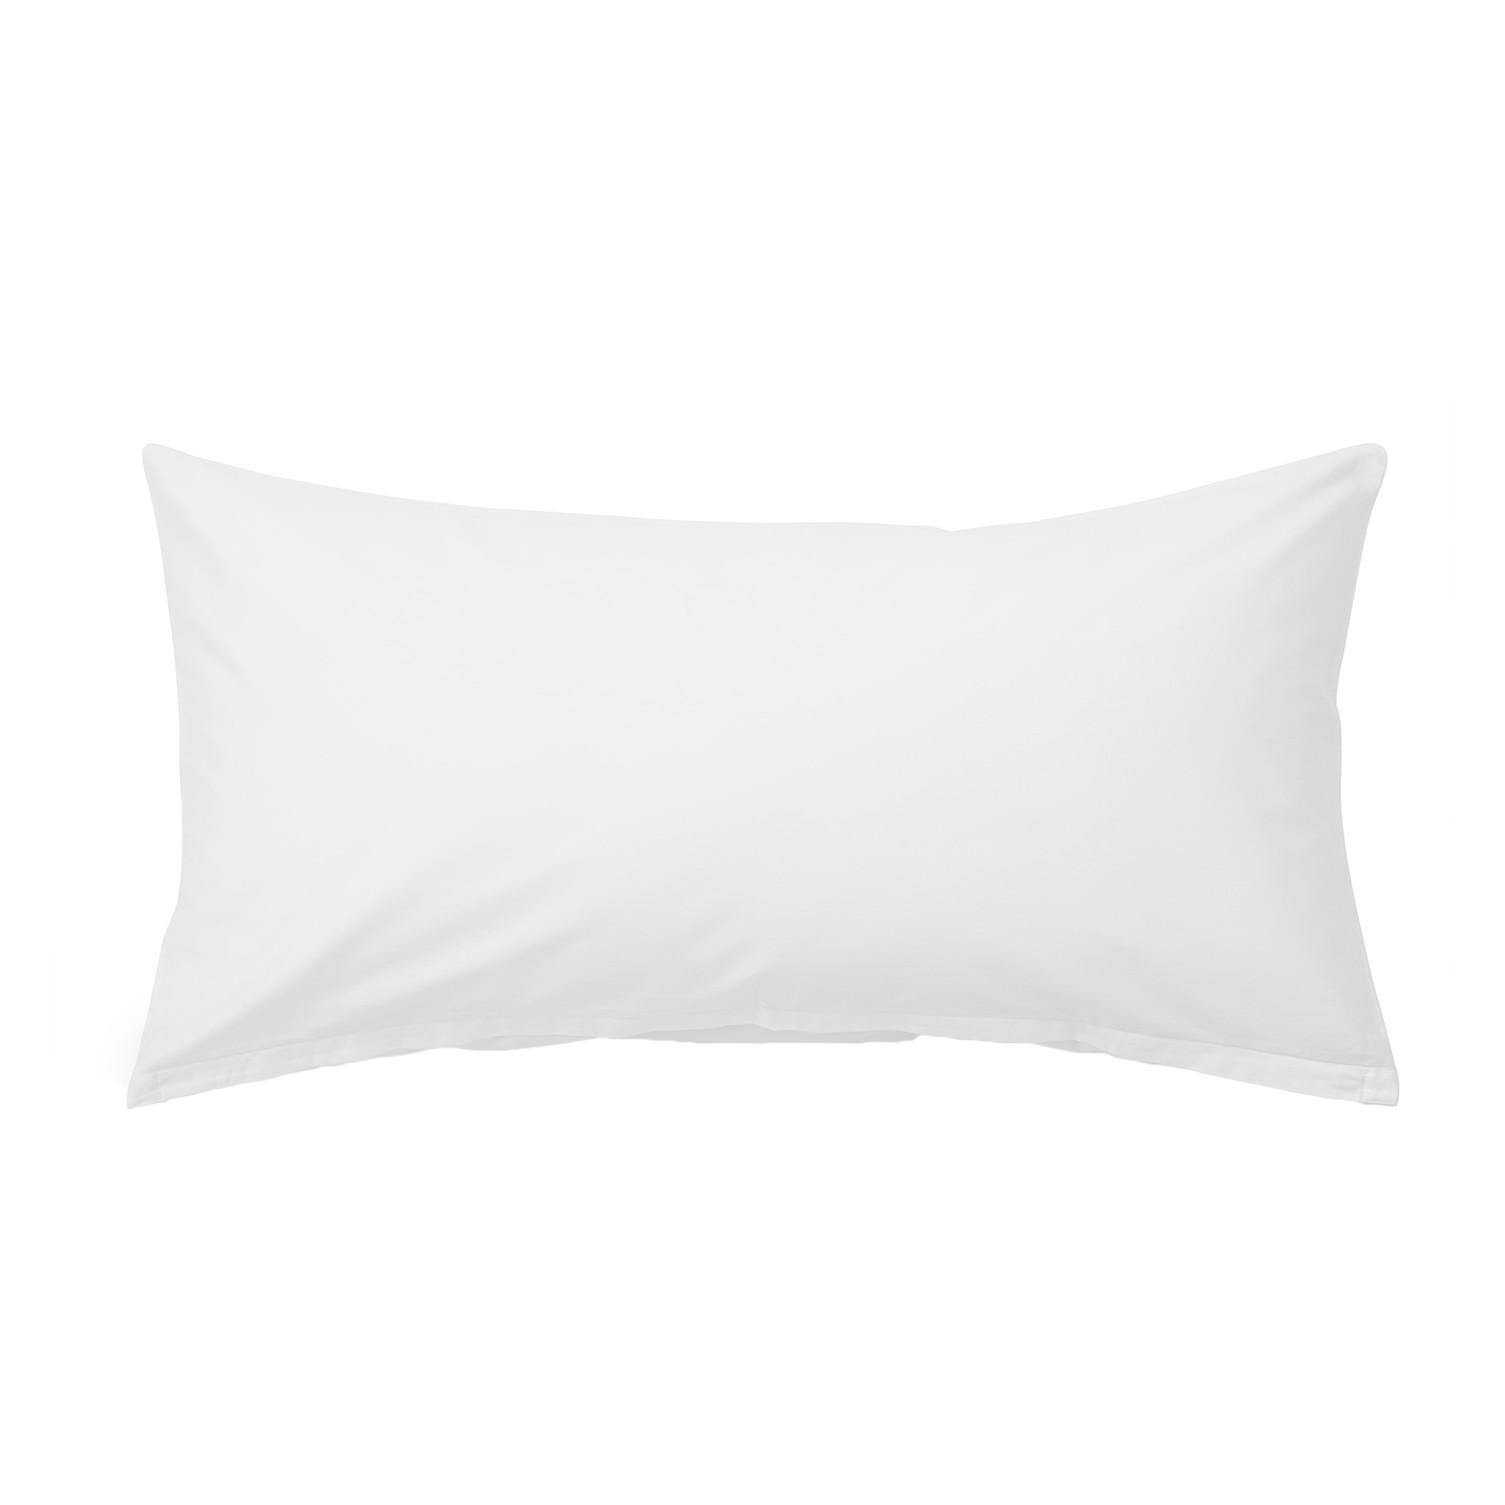 Kopfkissenbezug Nuvola - Baumwollstoff - Weiß - 40 x 80 cm